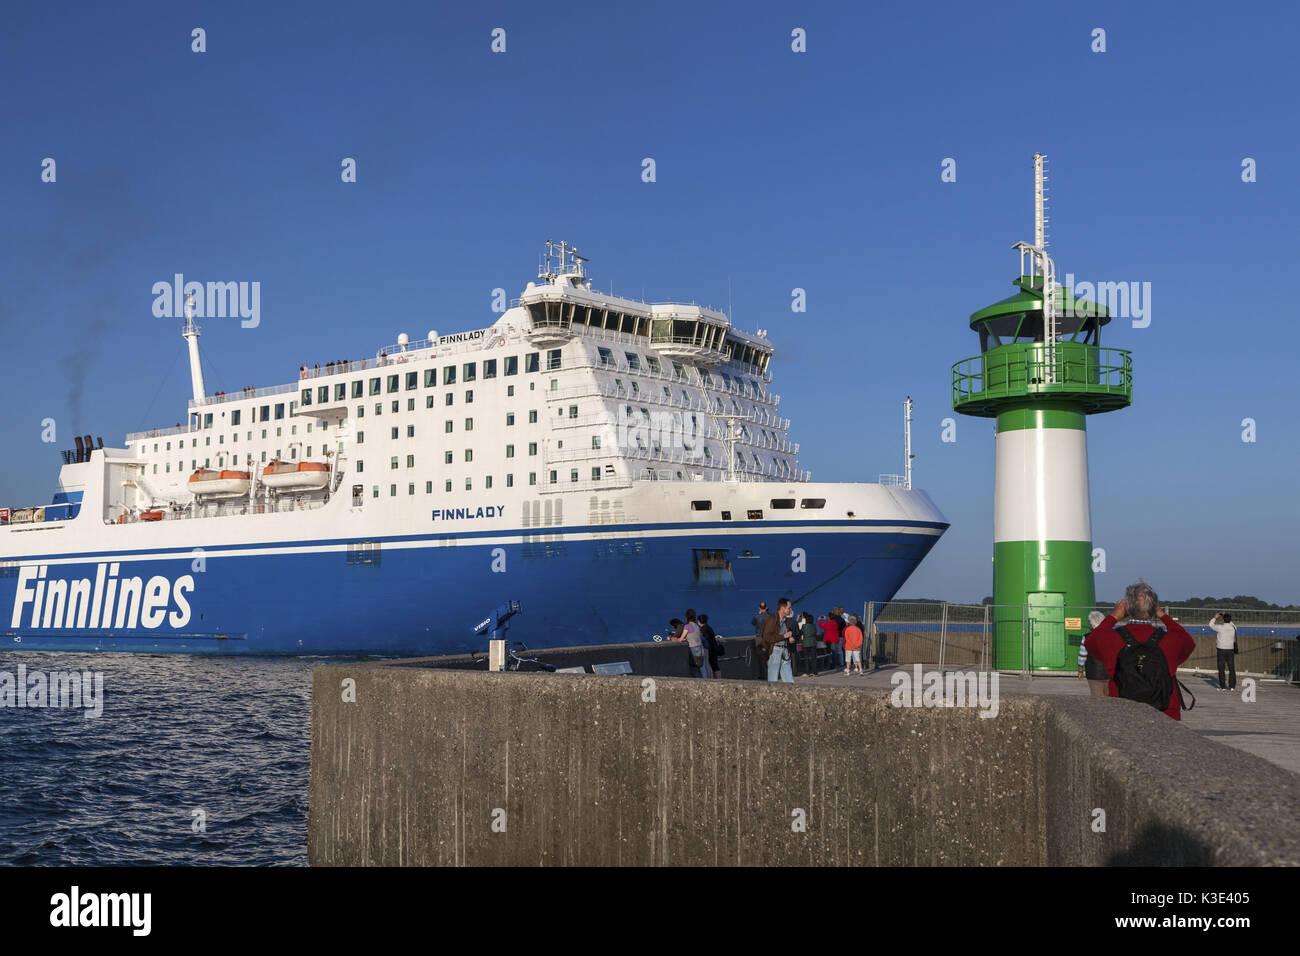 Ferry Finnlines in the lighthouse north mole, Travemünde, Hanseatic town Lübeck, Schleswig - Holstein, Germany, - Stock Image